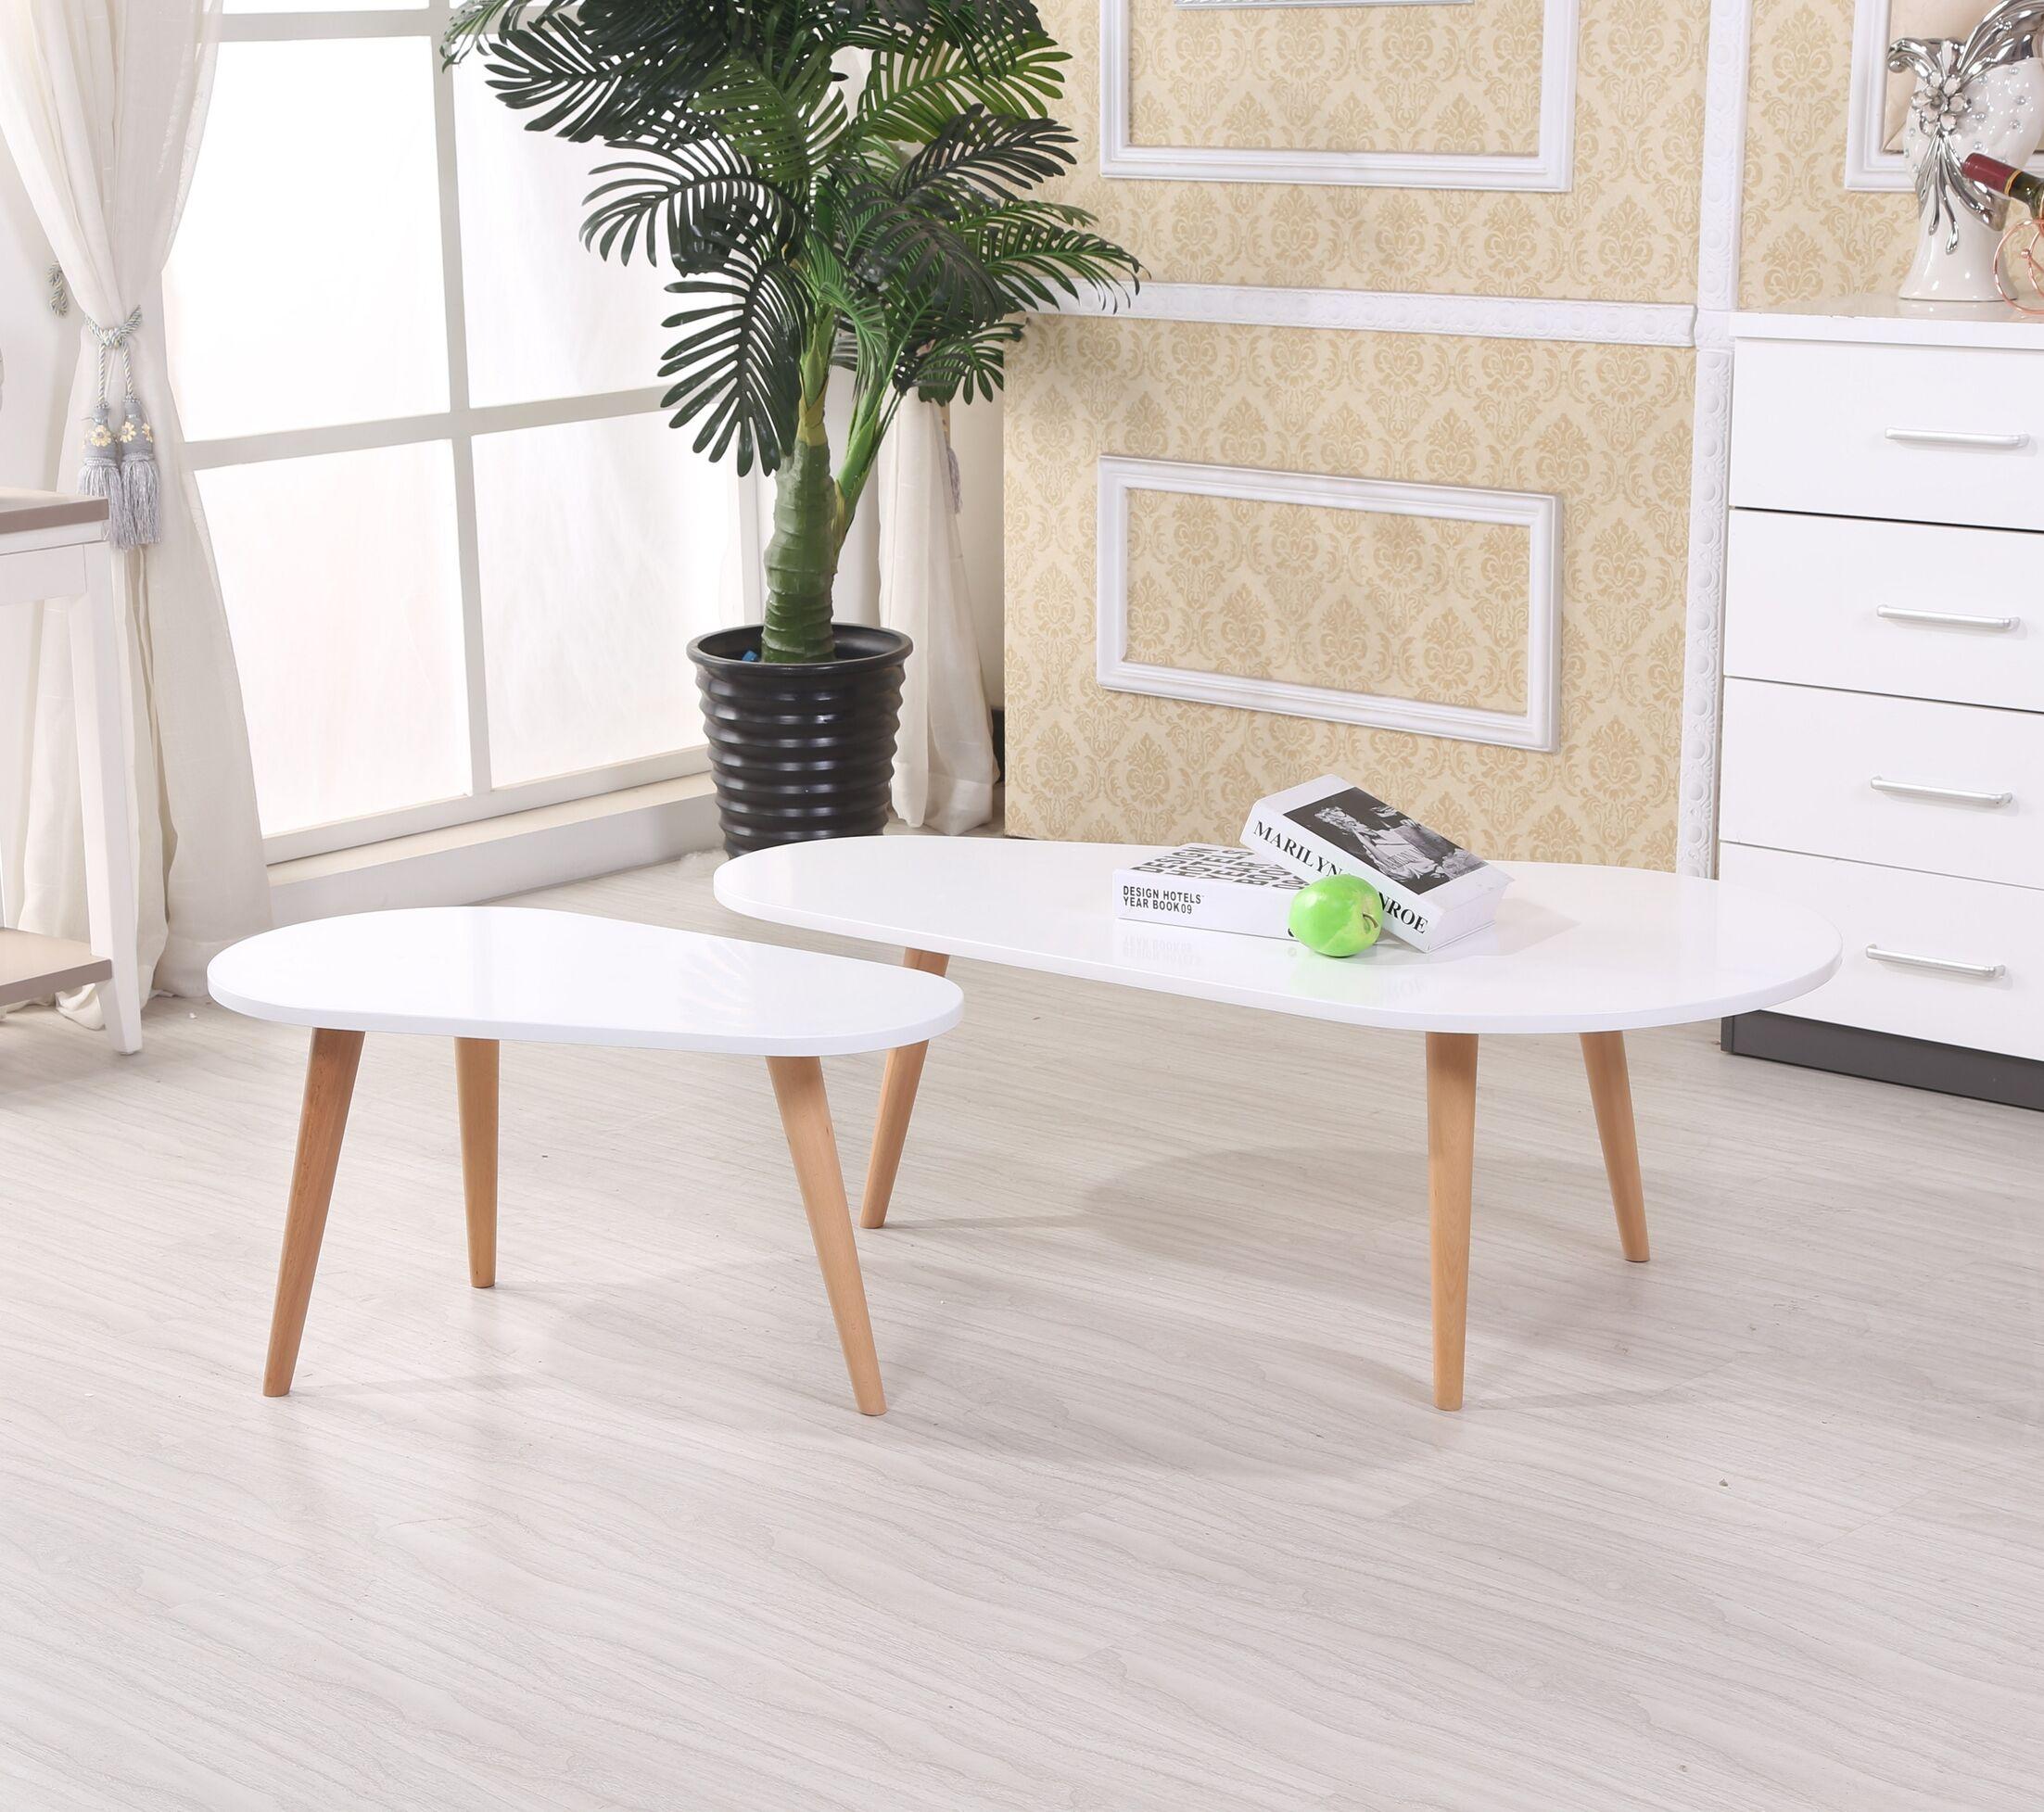 Sara 2 Piece Coffee Table Set Color: White